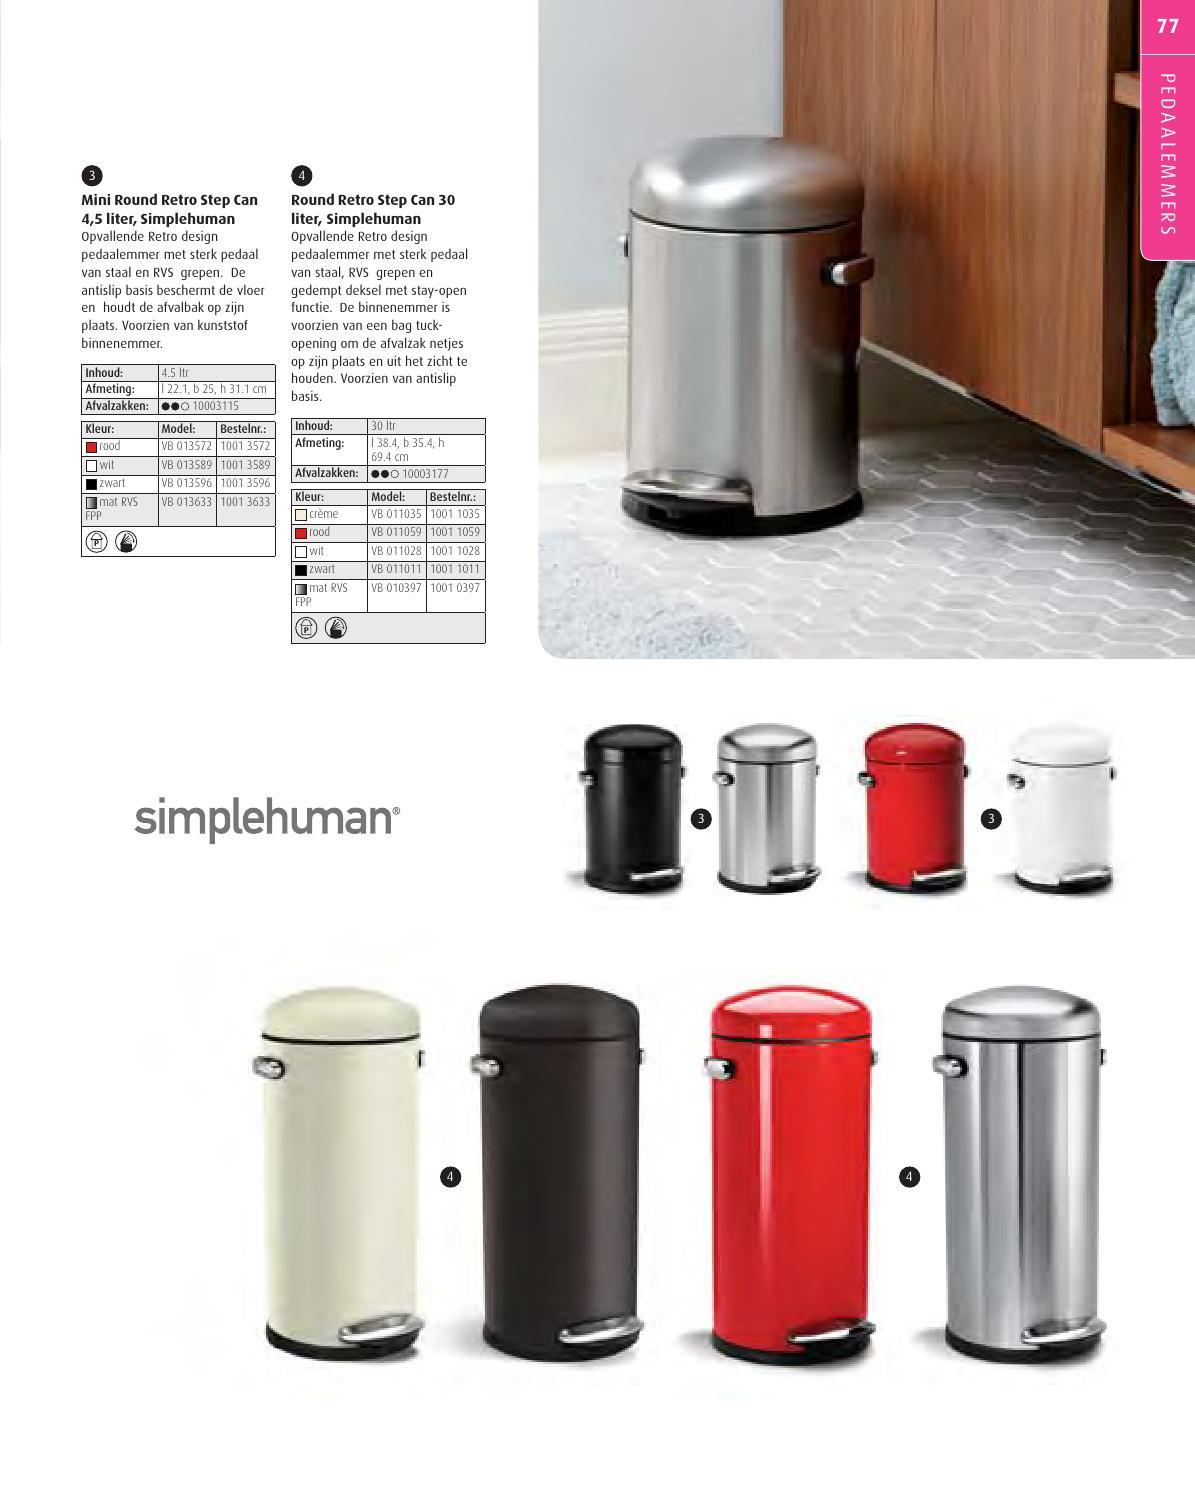 Simplehuman Round Retro Pedaalemmer 30 L Wit.Produkten Bielen Nv Vepa Bins Vuilbakken Folder By